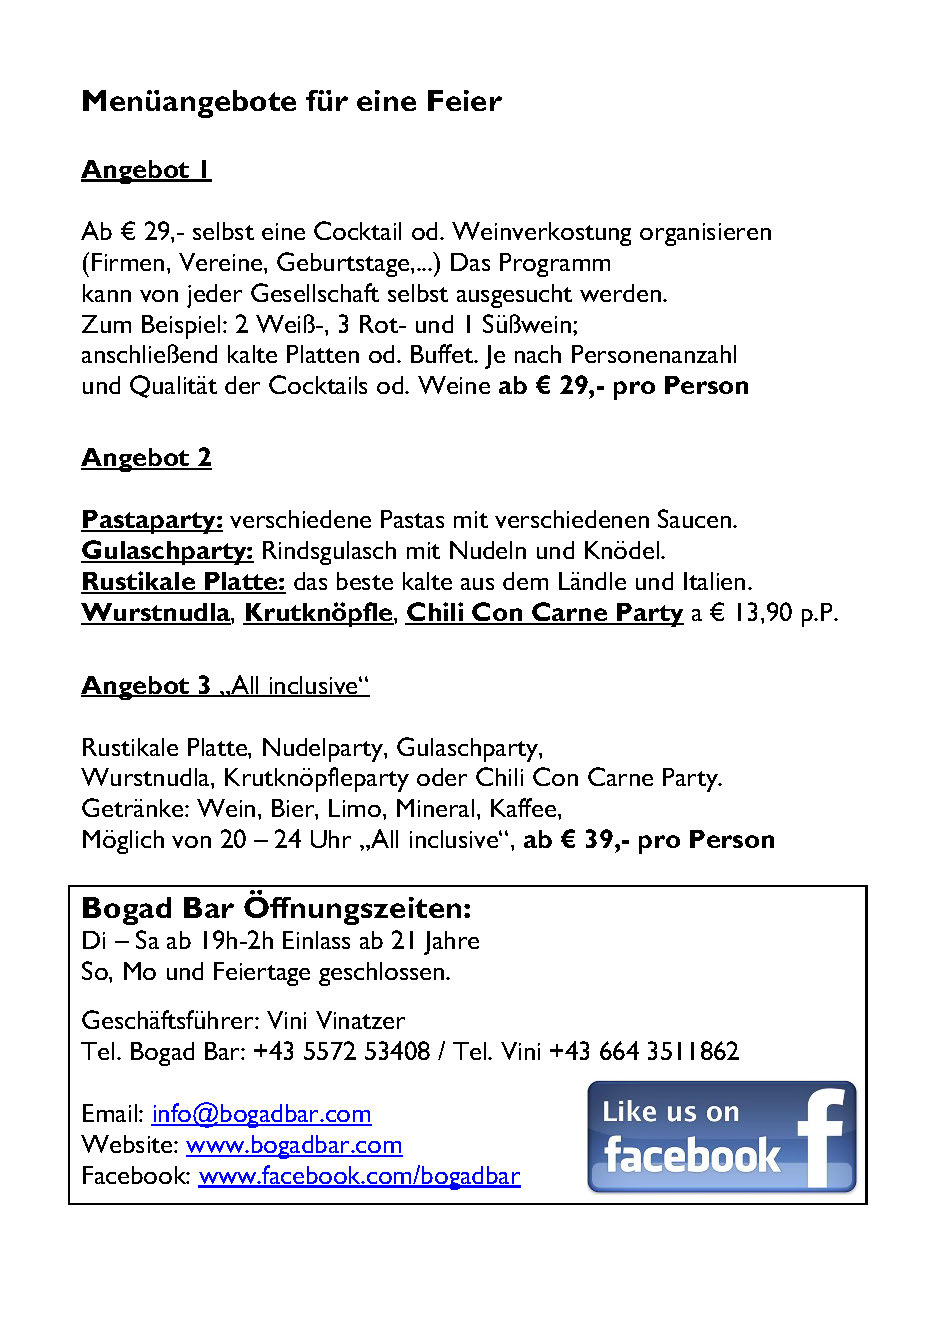 GK Bogad 28.6. 15h 2019-06-27 Menükarte V03_Seite_24